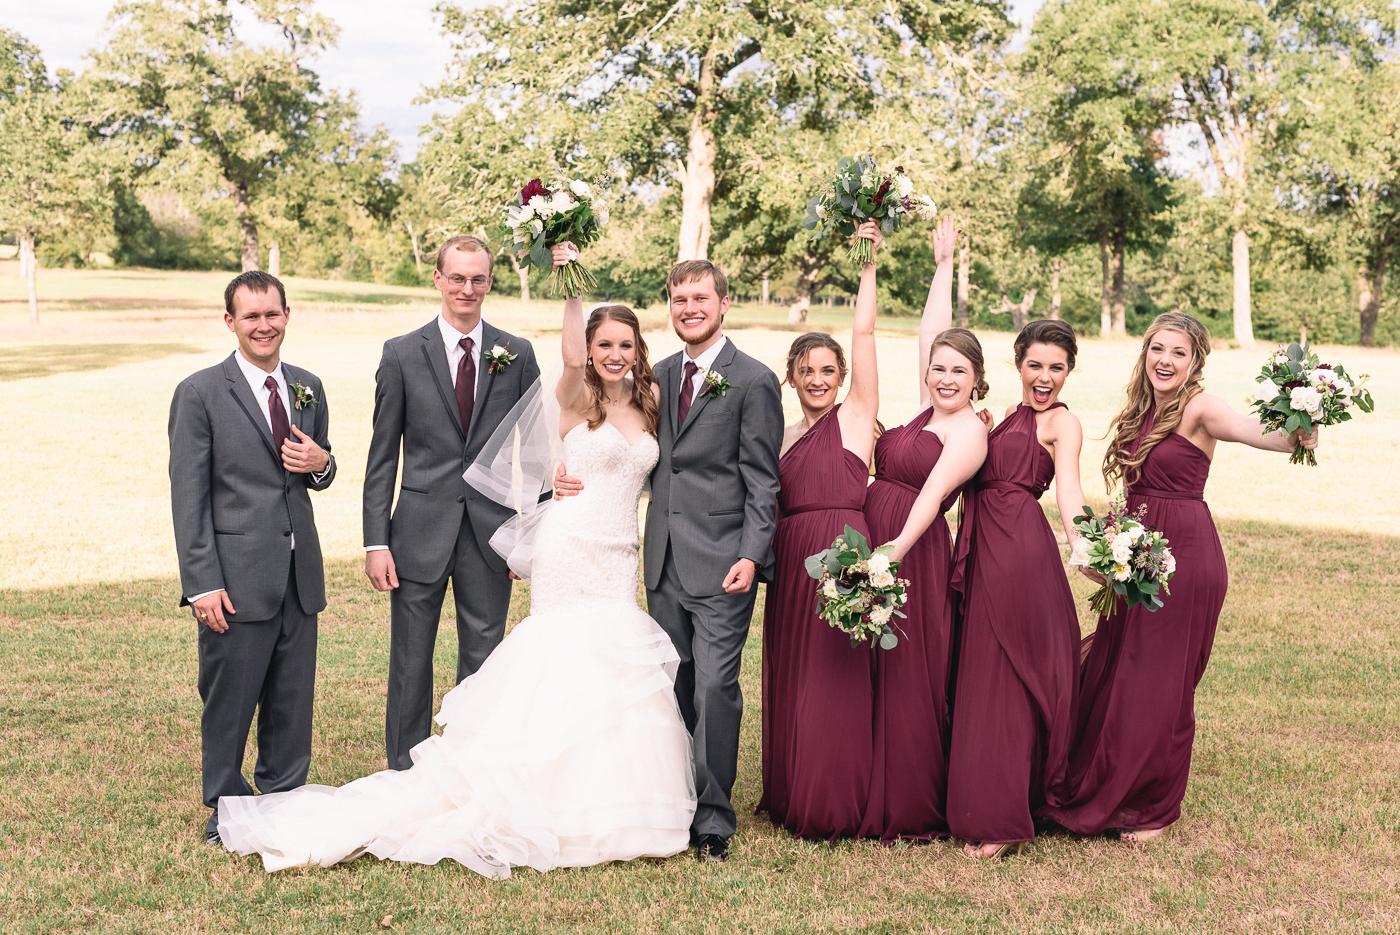 wedding party wedding portrait bridesmaids groomsmen broken arrow ranch college station candid shot